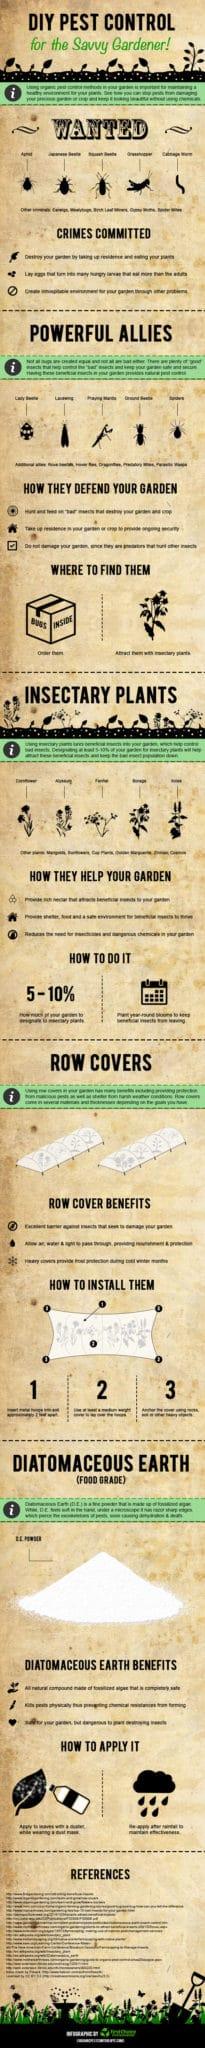 DIY Garden Pest Control Infographic